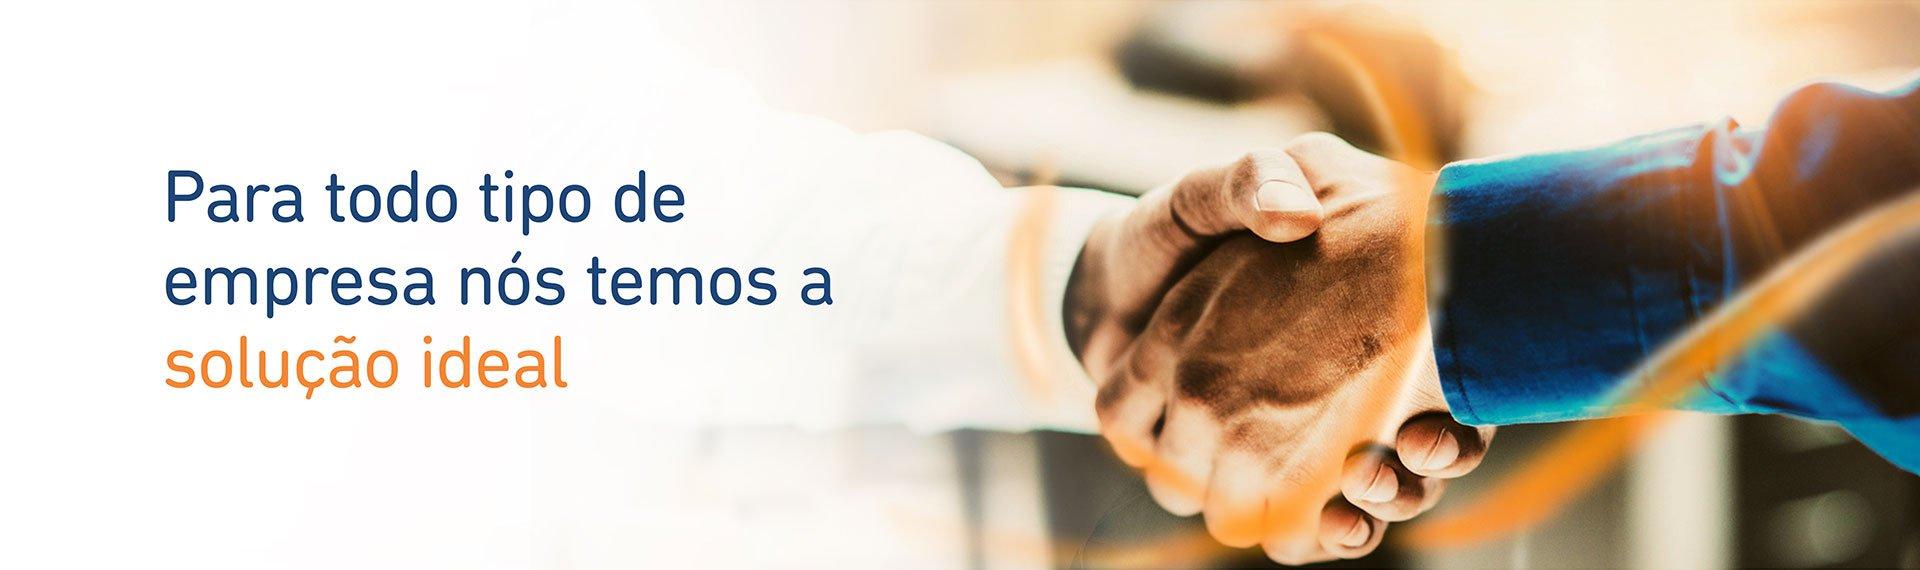 para empresas 1 - Global Lines - Para Empresas